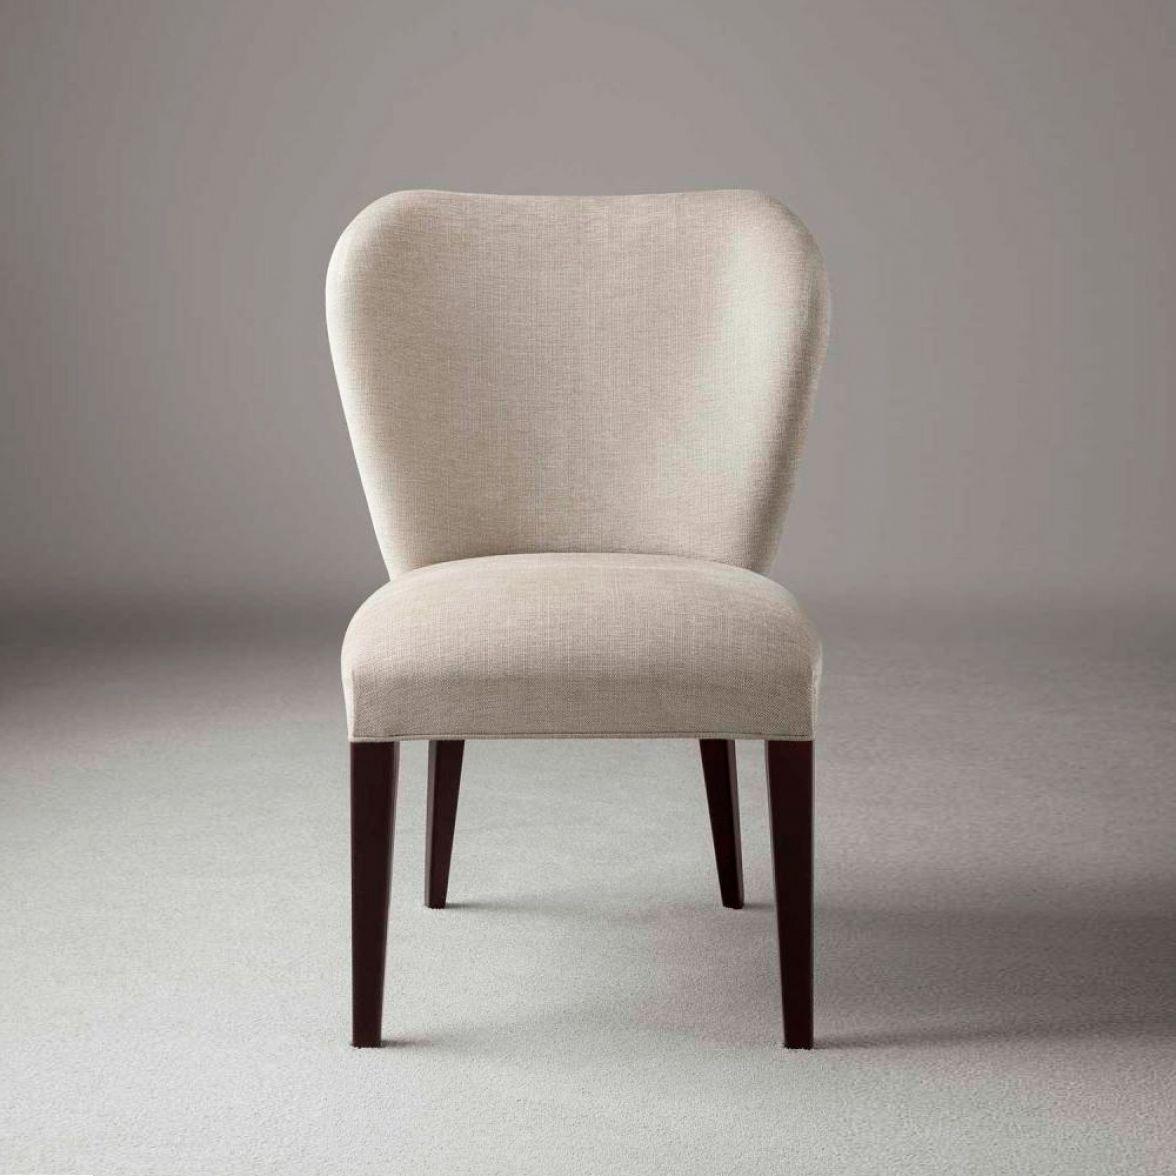 Frances chair